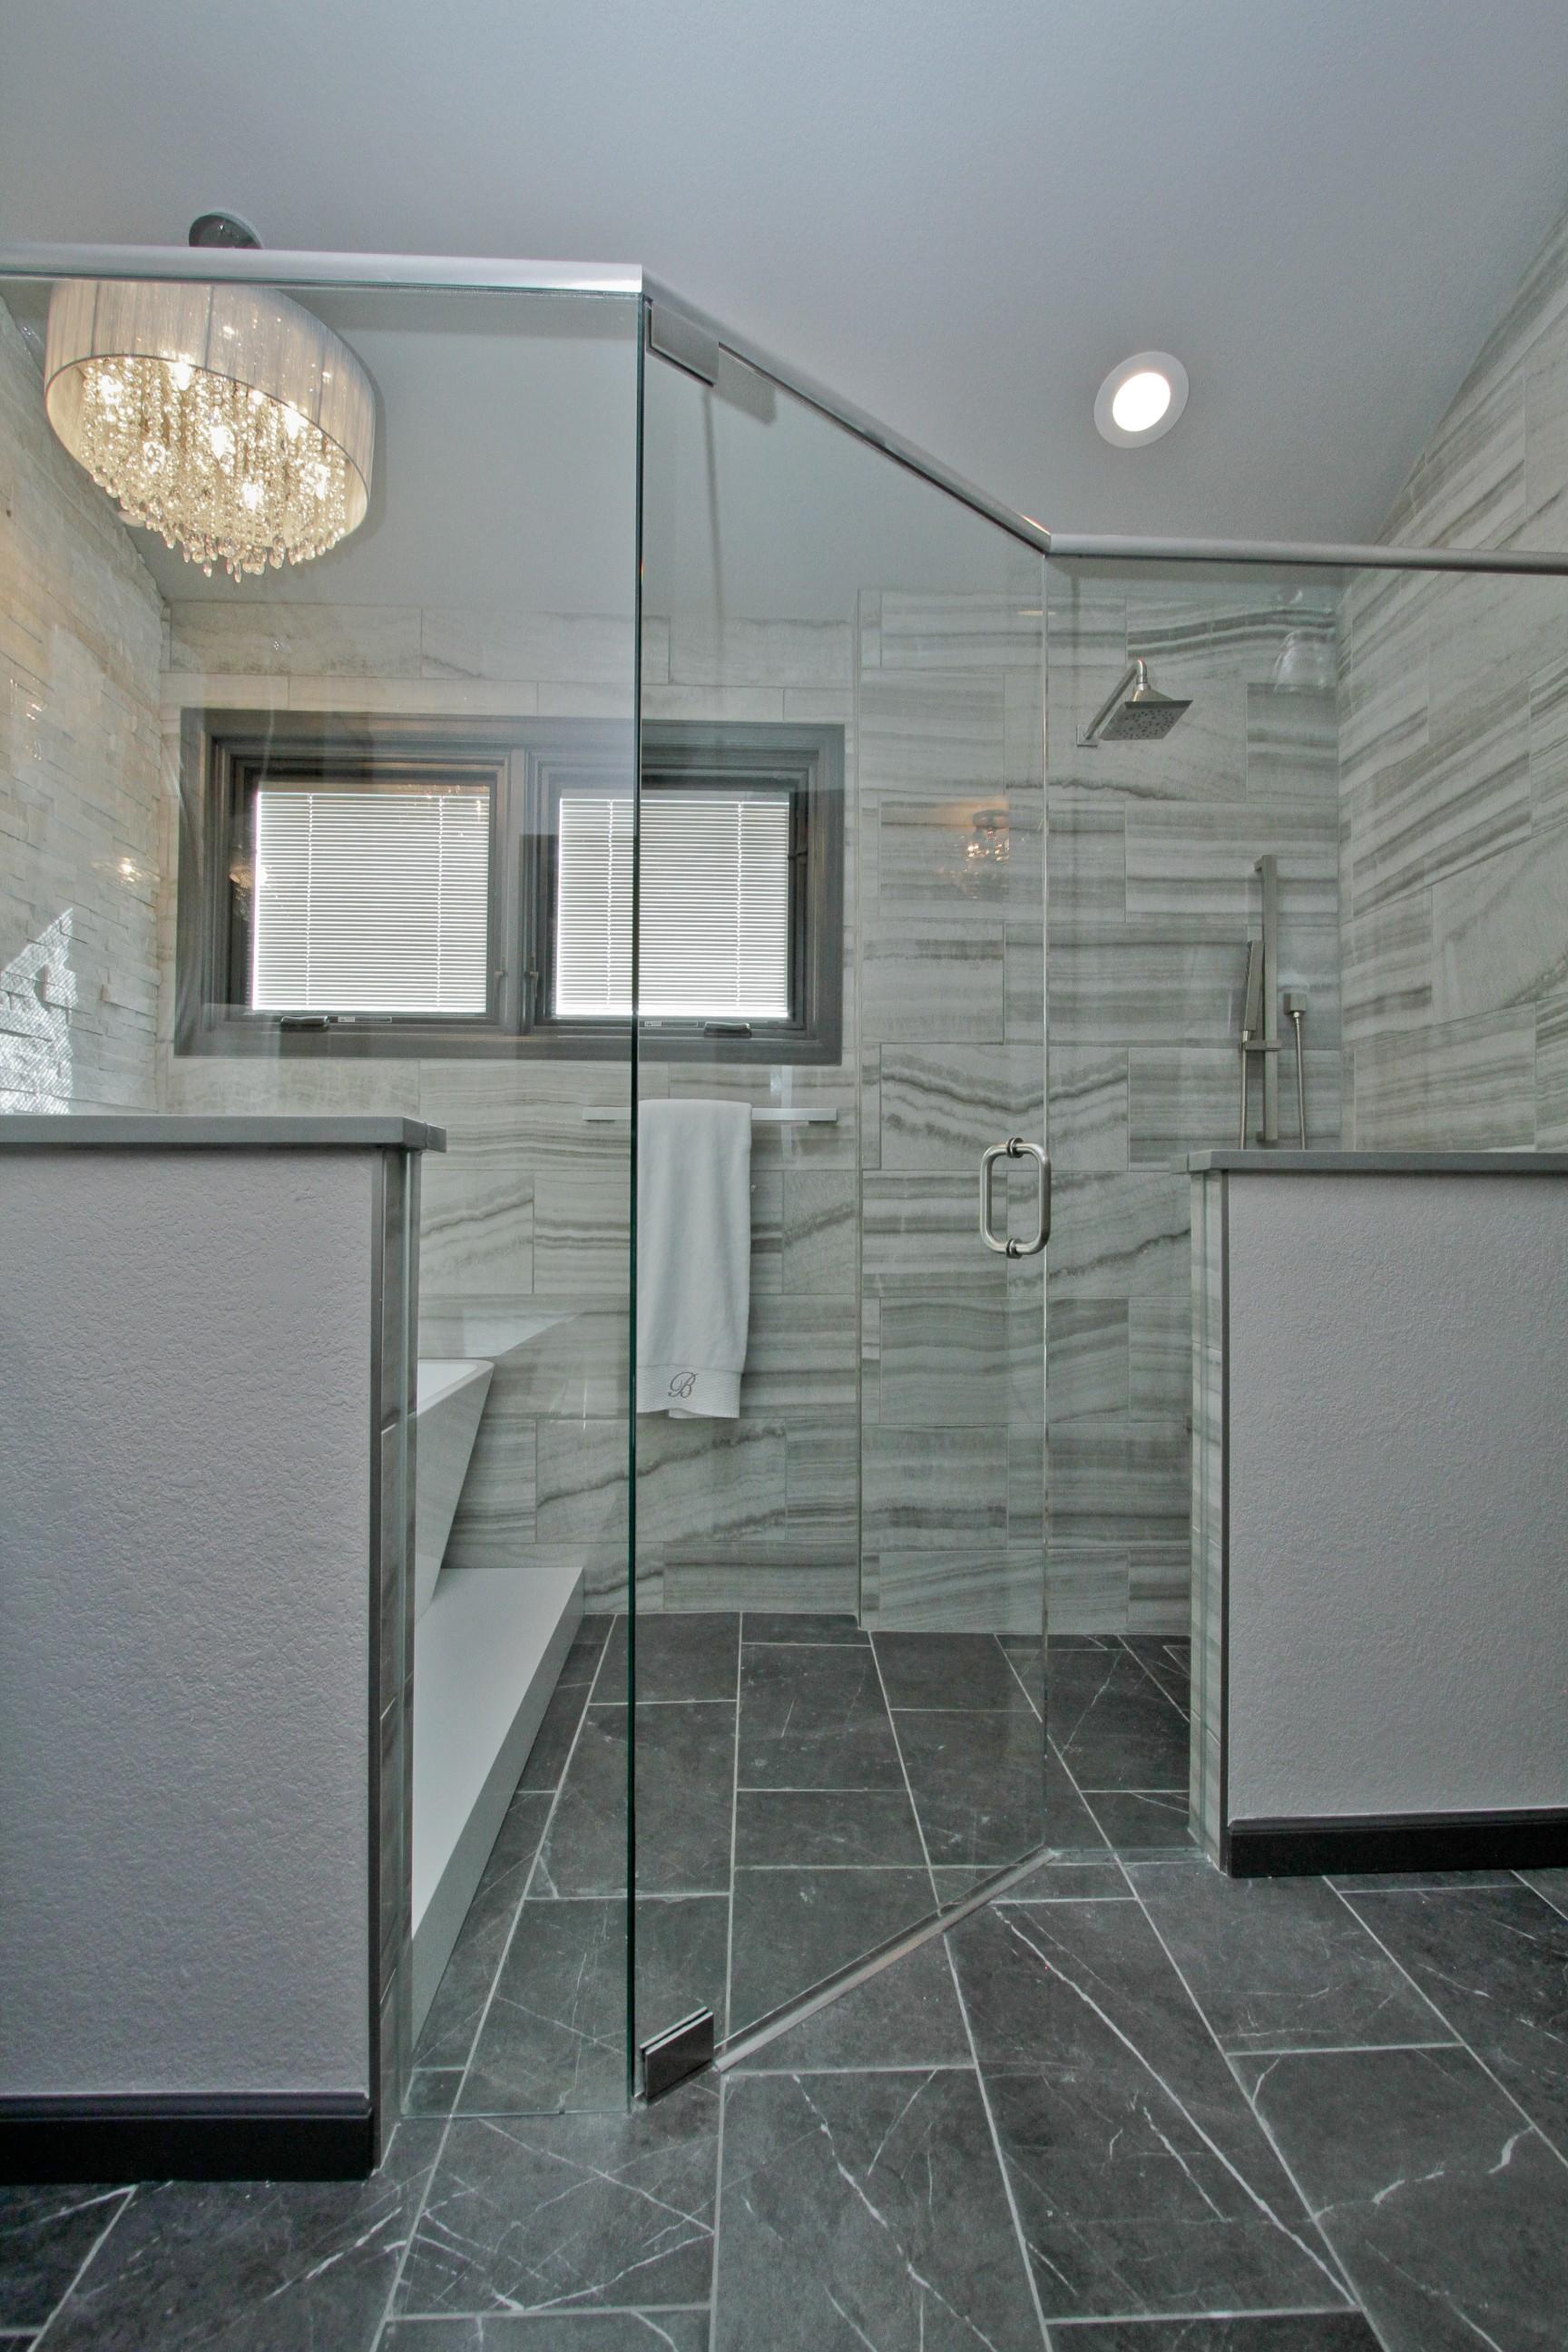 Cress Kitchen And Bath Reviews  Dandk Organizer